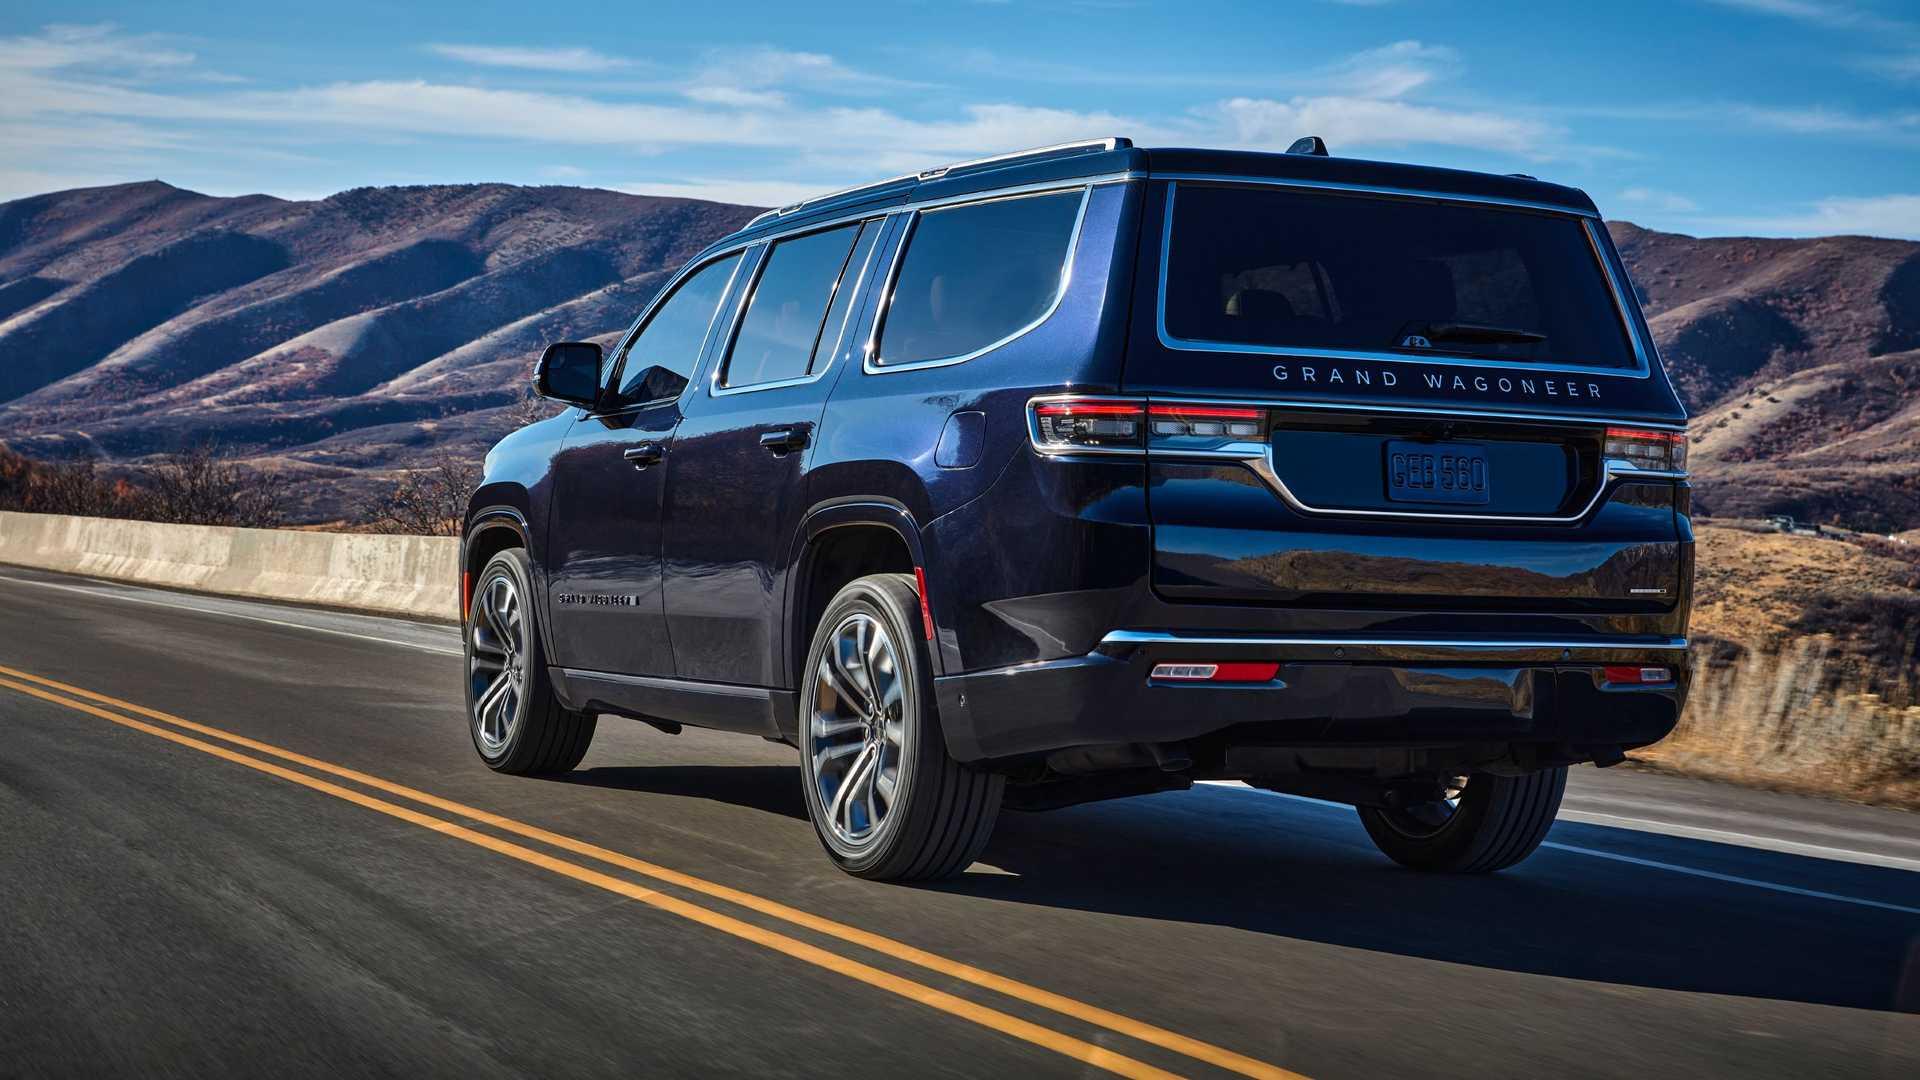 2022-jeep-grand-wagoneer-exterior-rear-quarter-7